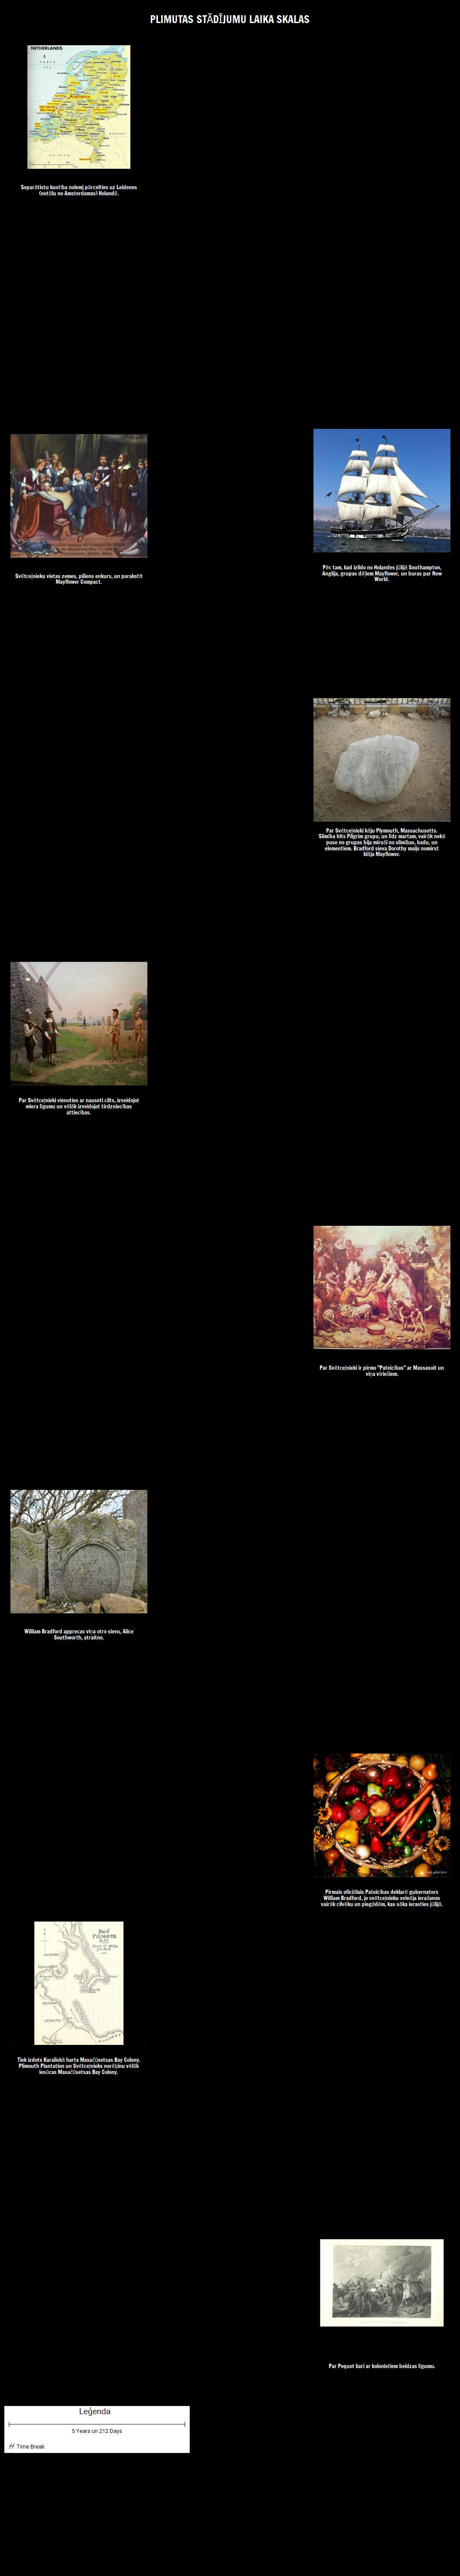 Plimutas Plantation Timeline